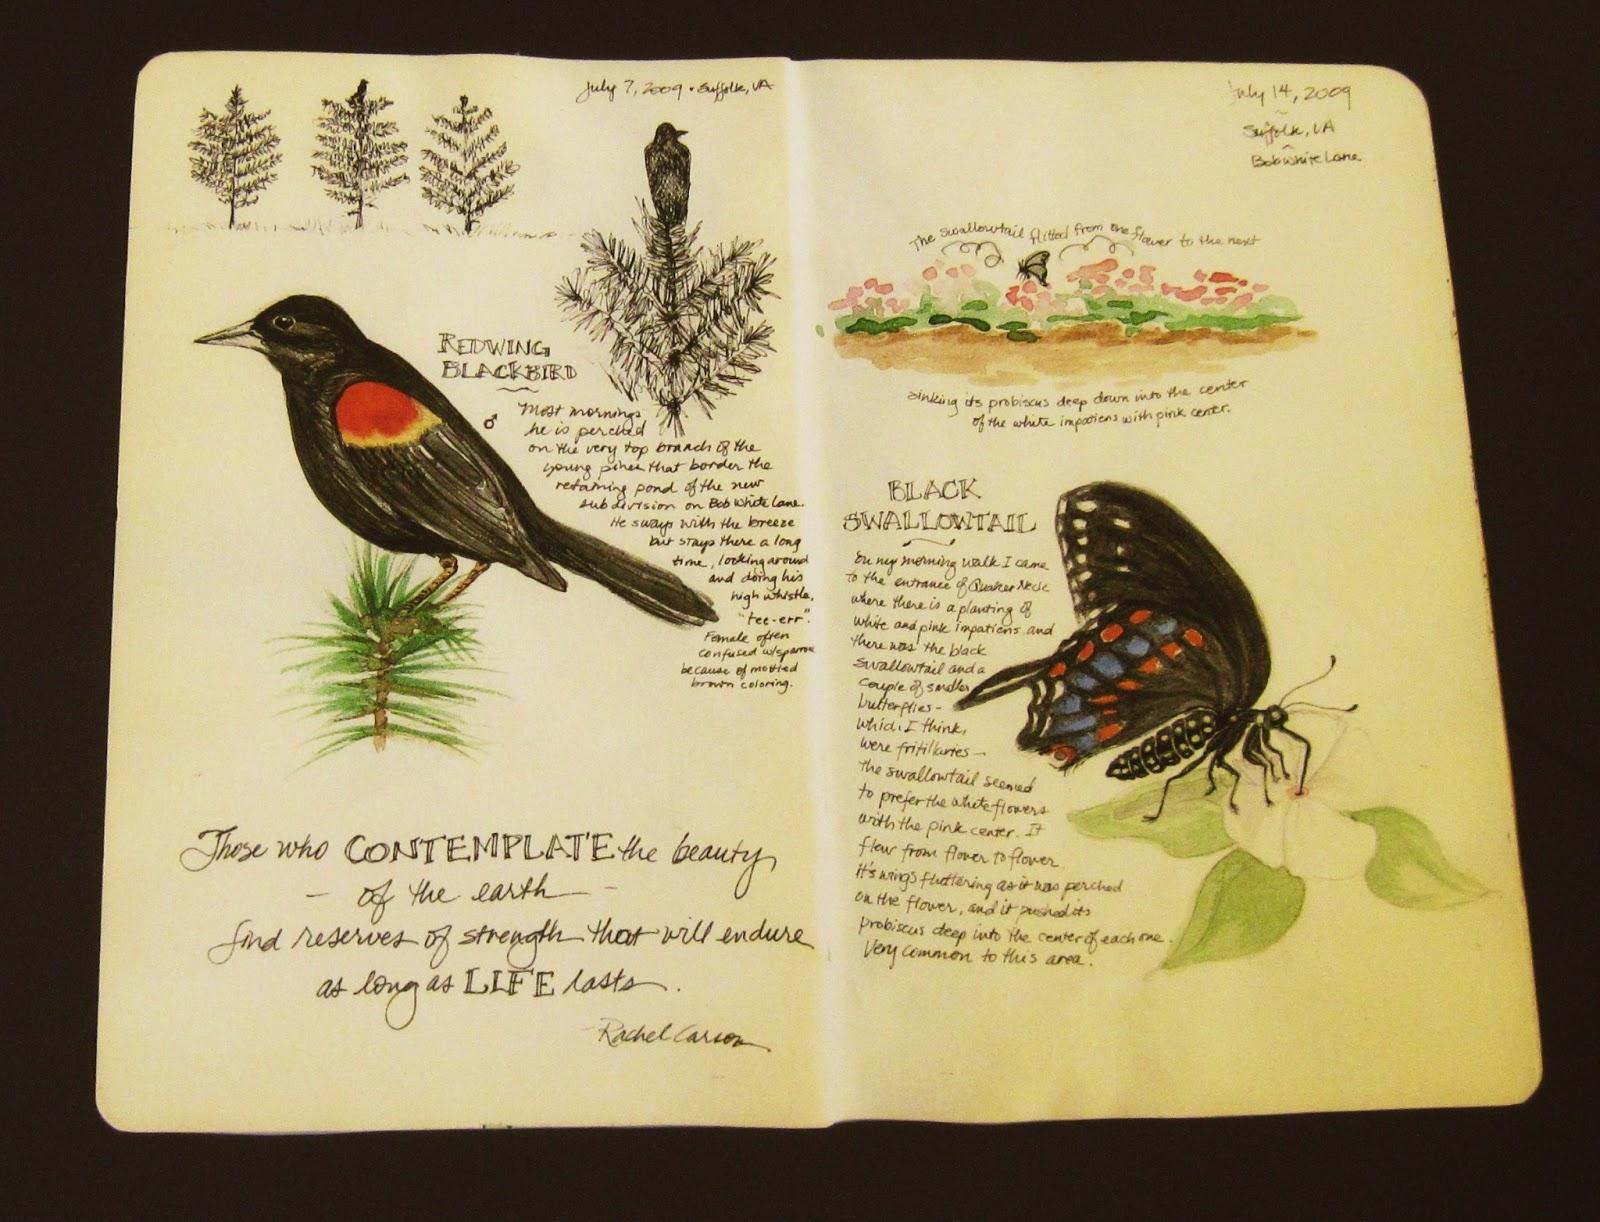 nature journals journaling journal botanical haaland drawing writing artists tn roseanna virginia redwing swallowtail library exploring enjoy garden roseanne central